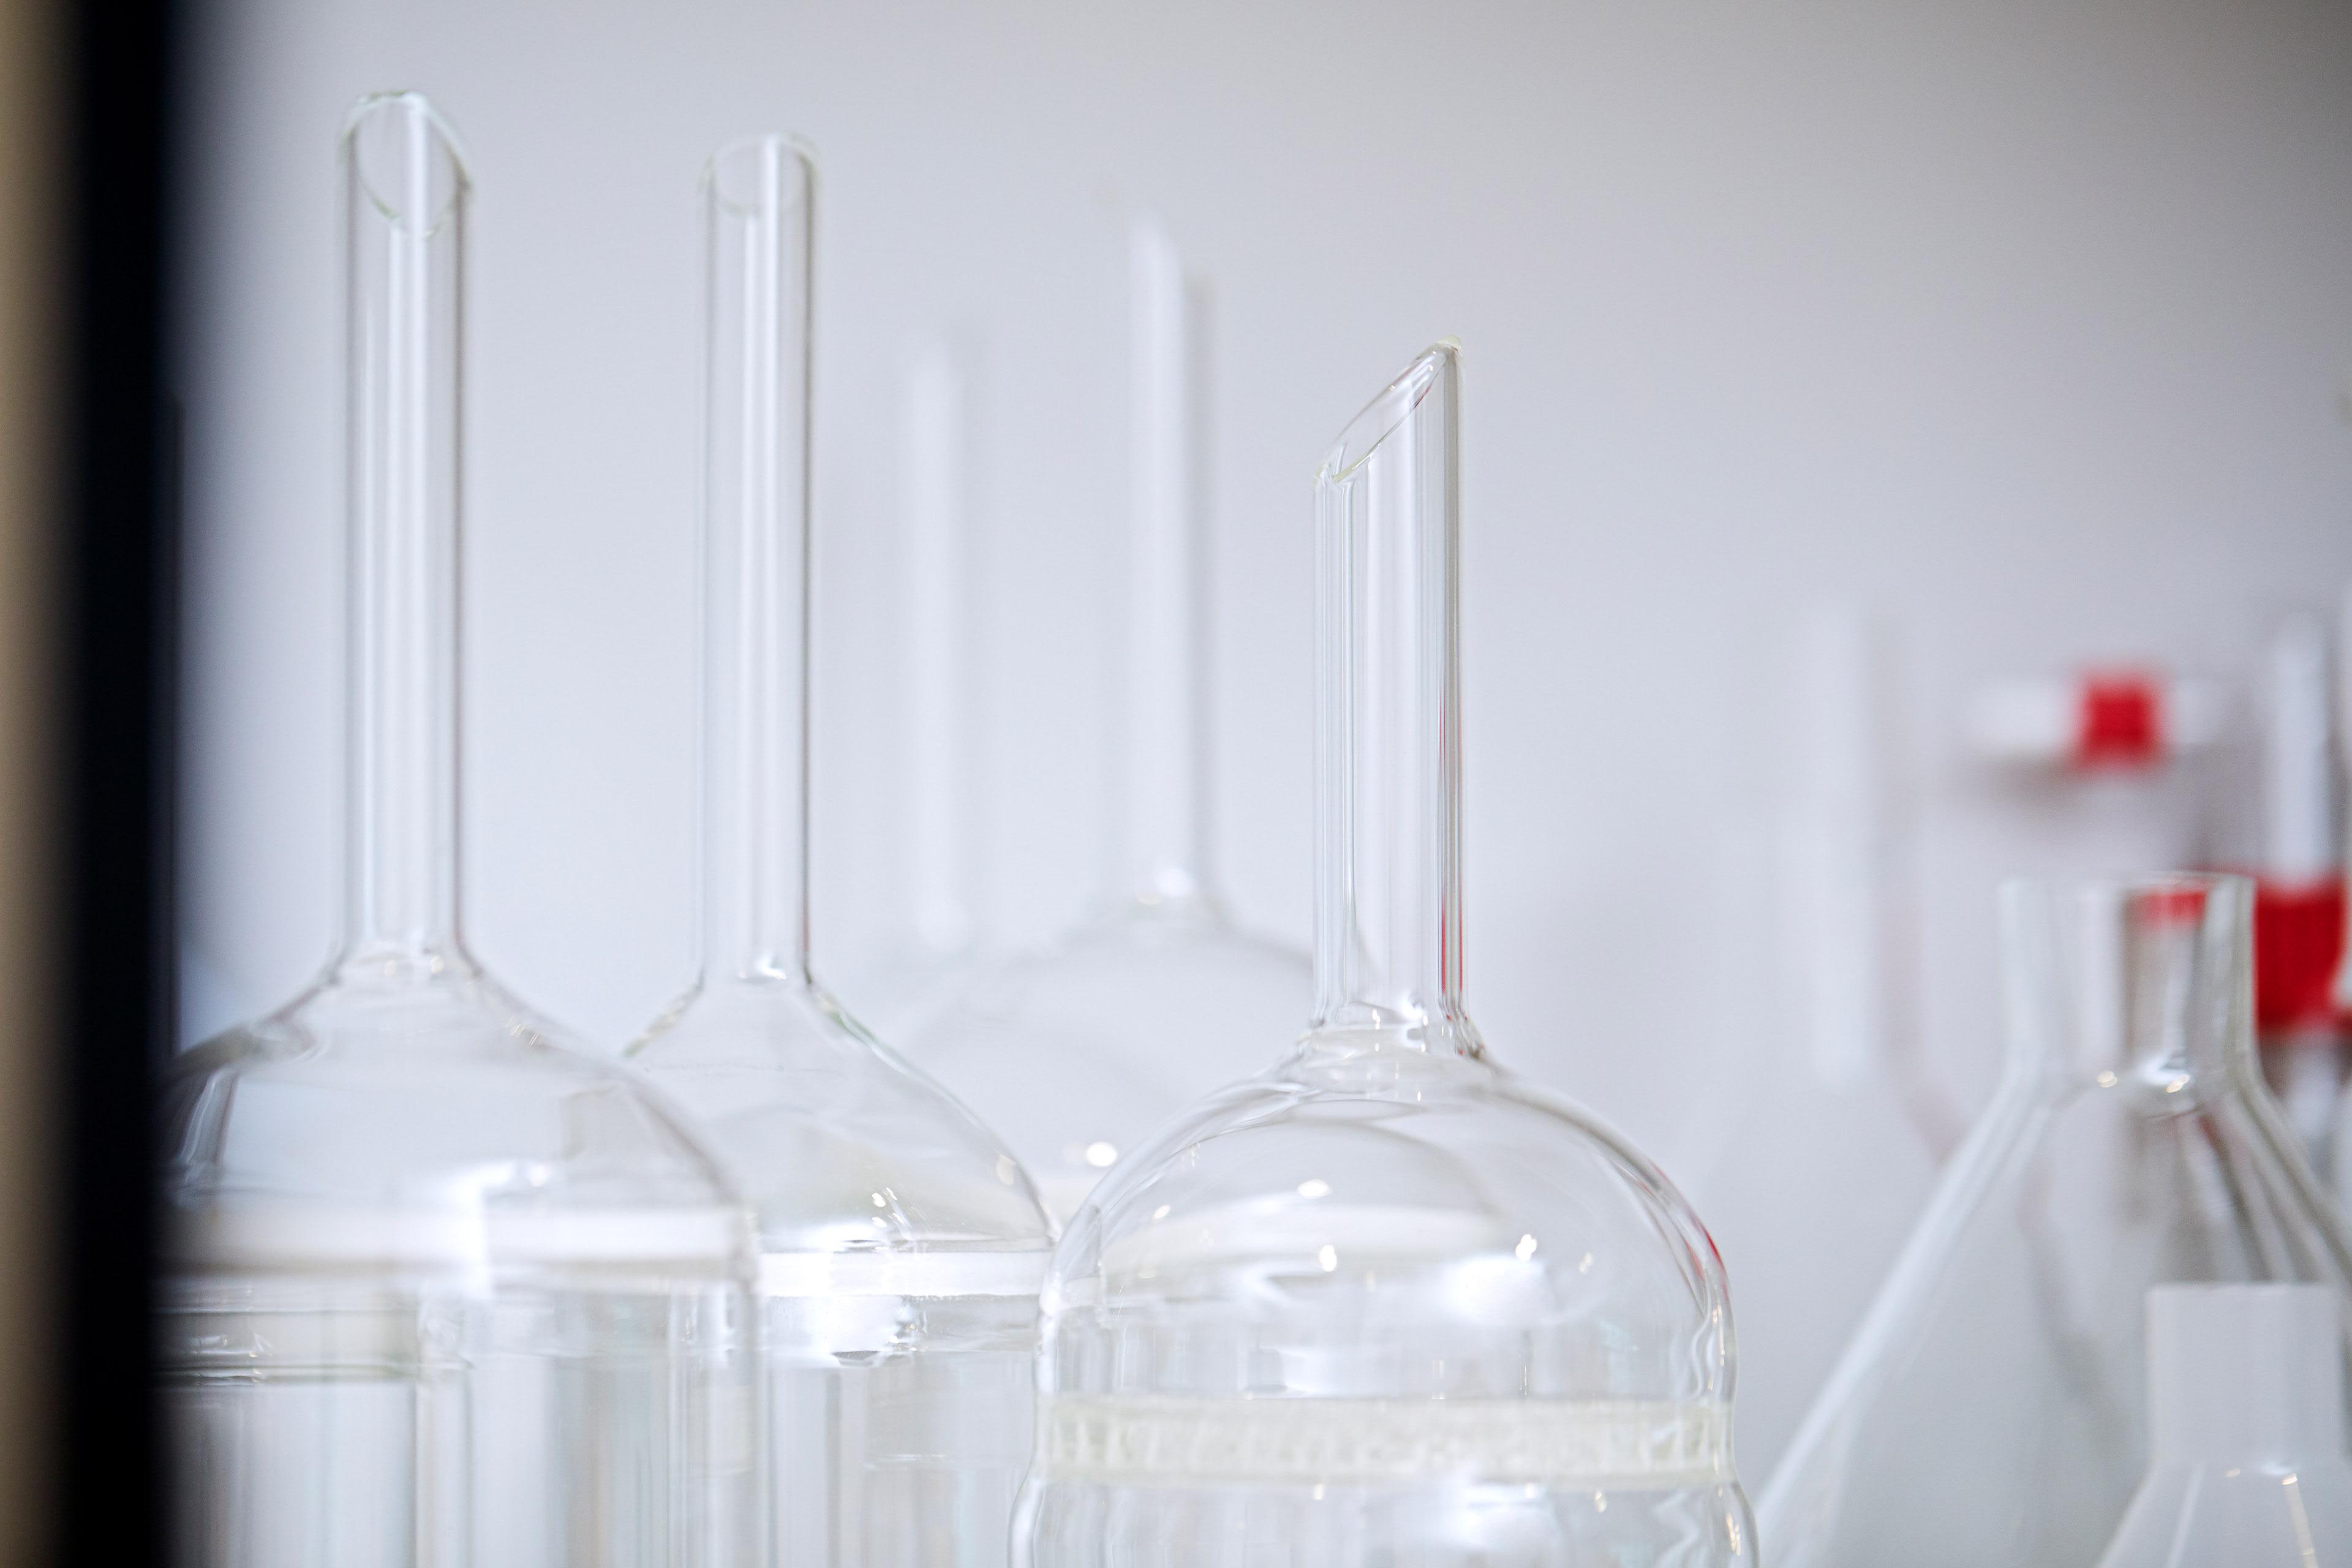 Richard Moran GSK Pharma Science Detail 013